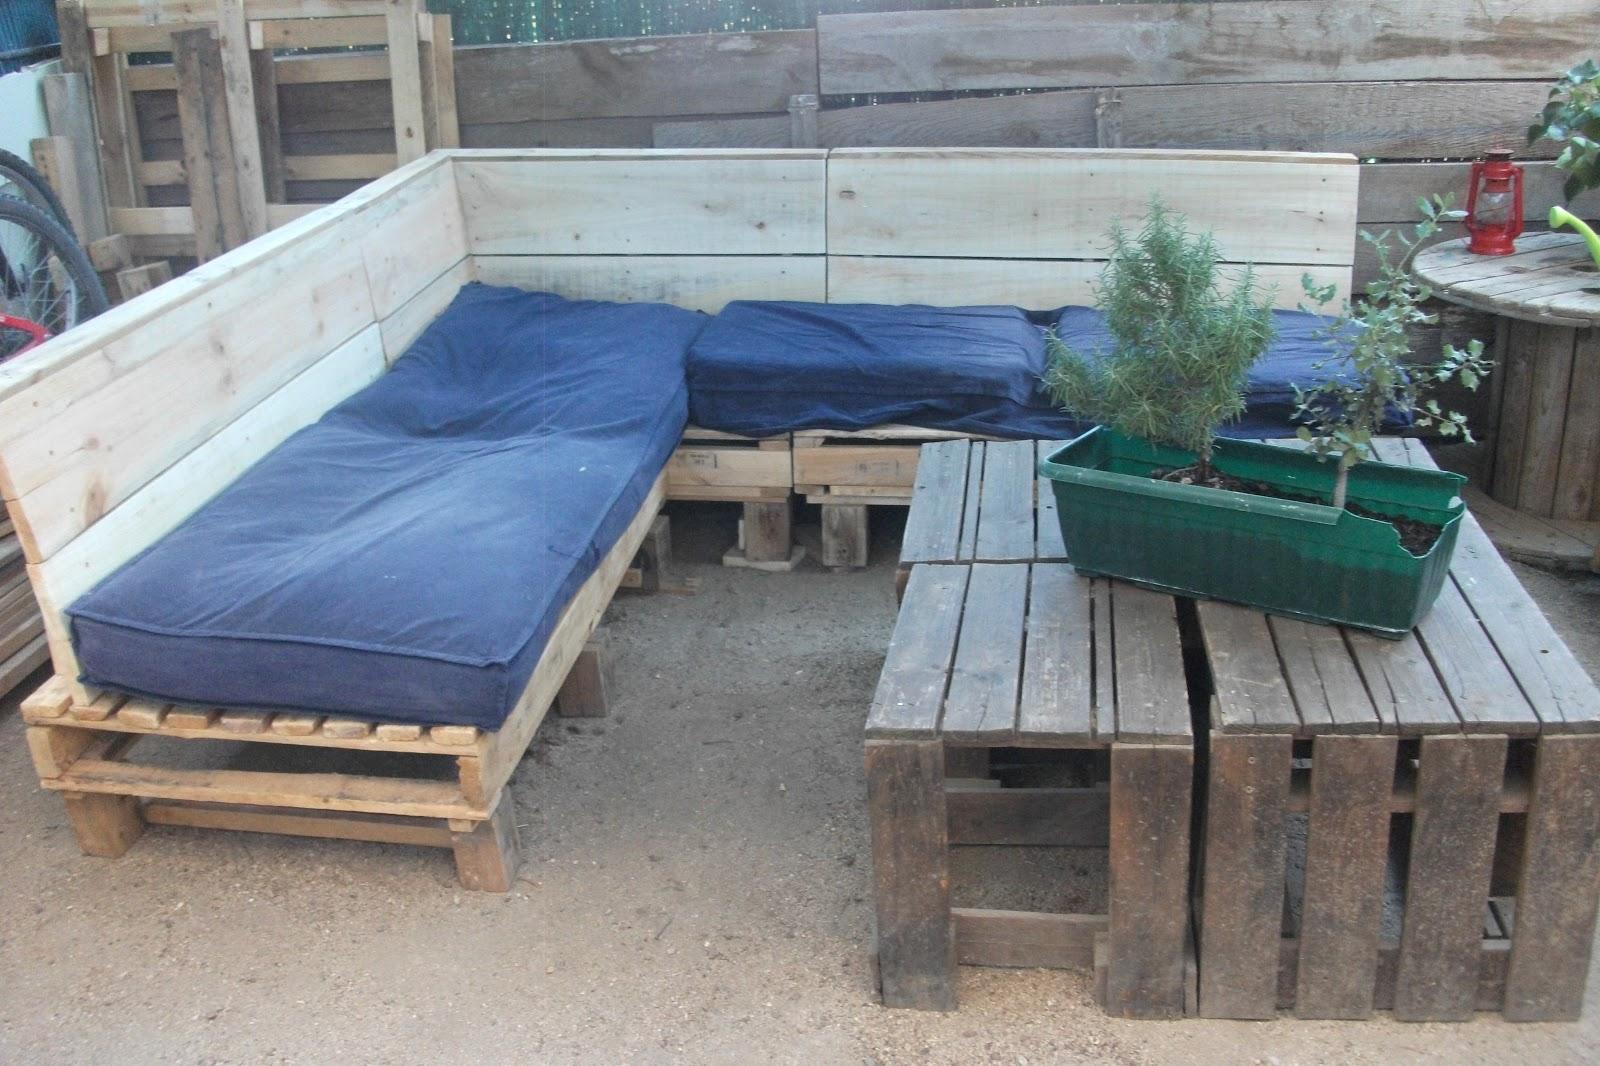 Renovarte con palets para el descanso os ponemos ideas - Como hacer un sillon de madera ...